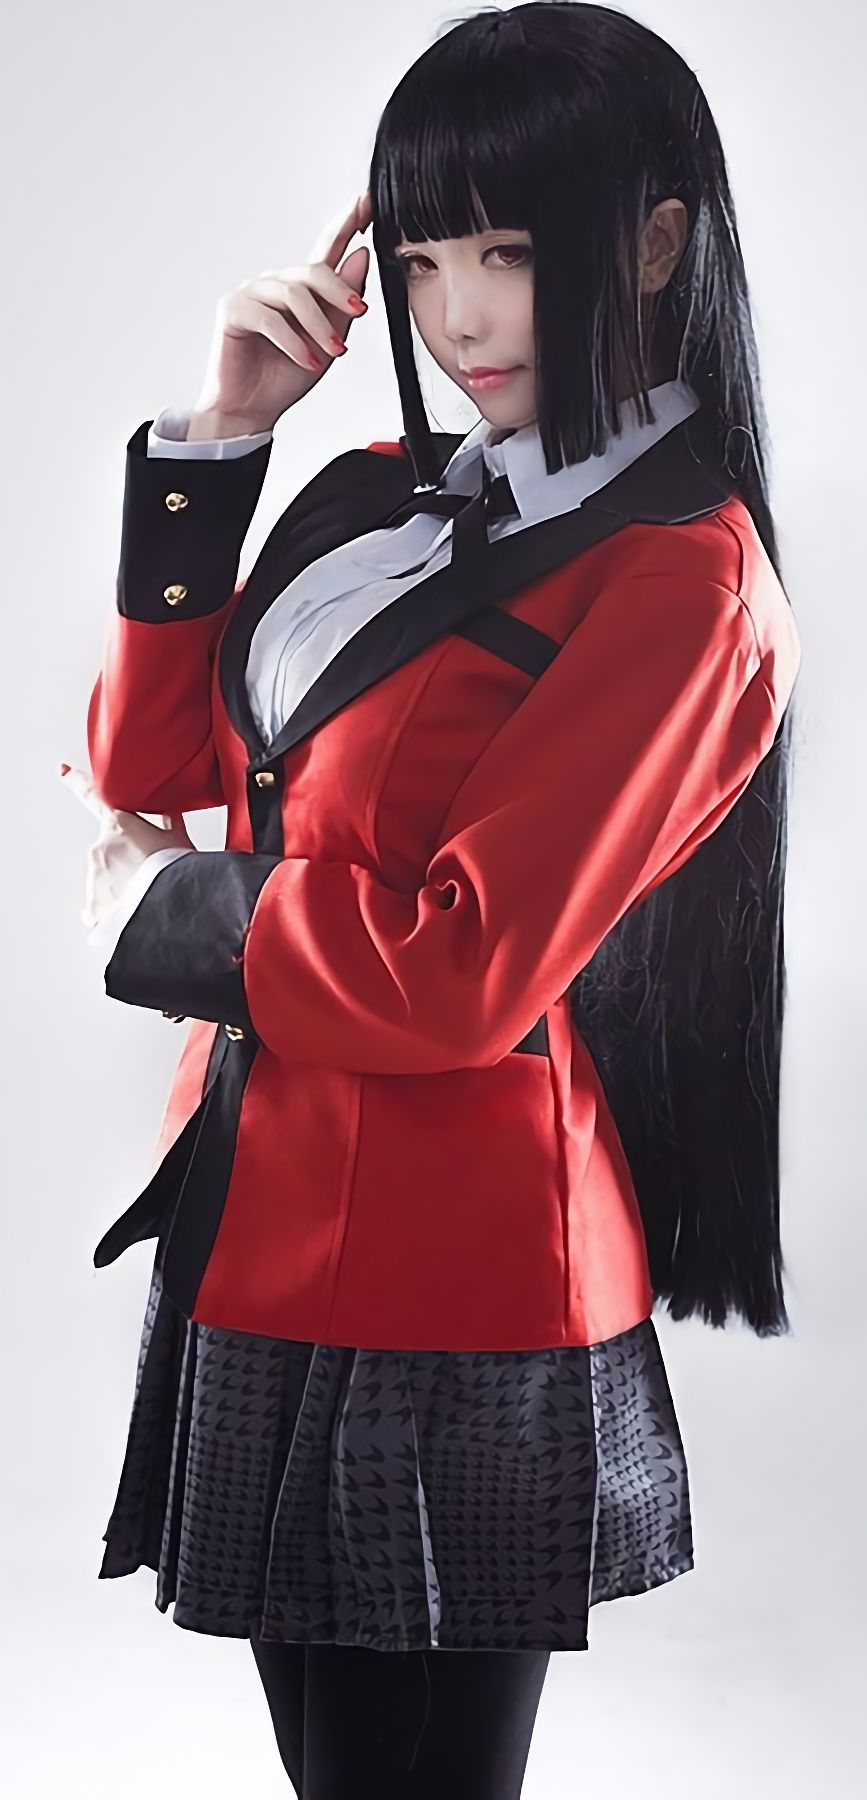 c2de315655d New Anime Kakegurui Yumeko Jabami Cosplay Costumes School Girls ...